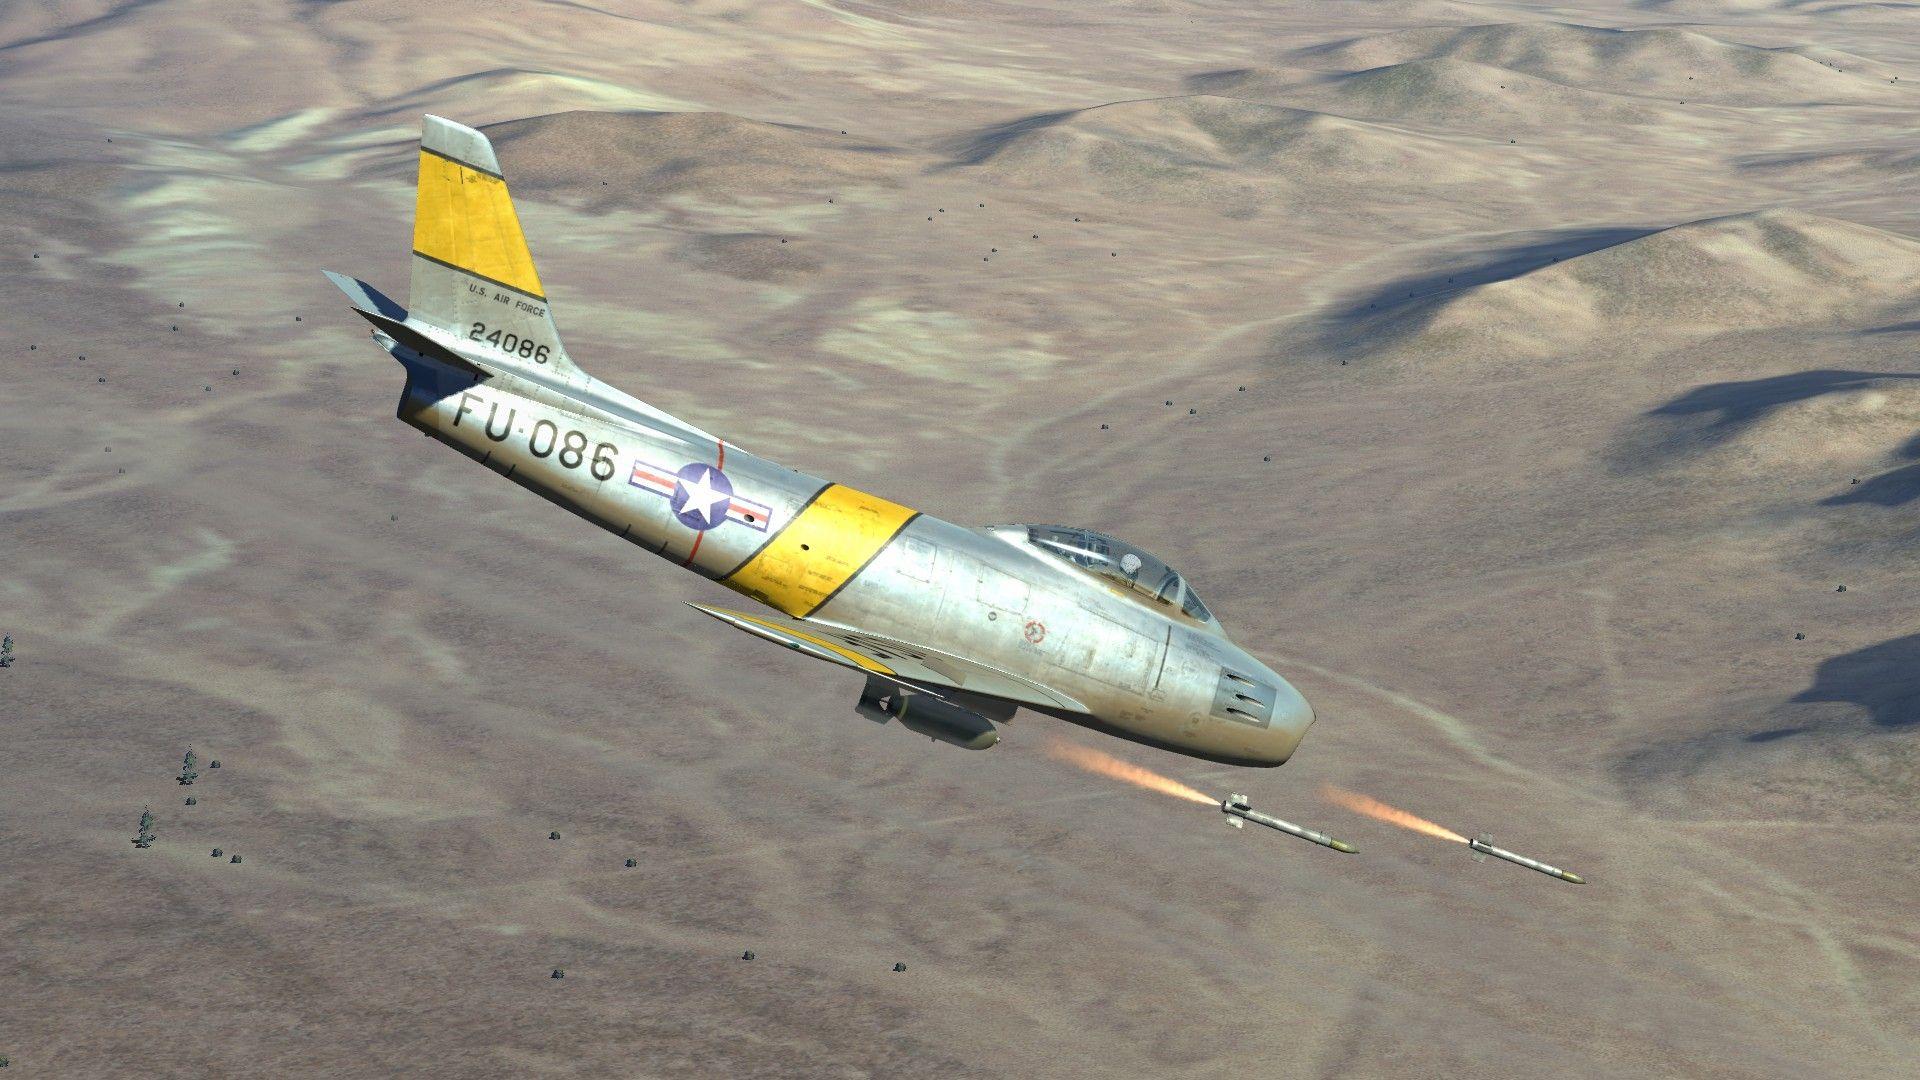 F-86 Sabre firing rockets (DCS World) | Gaming 3D Graphics